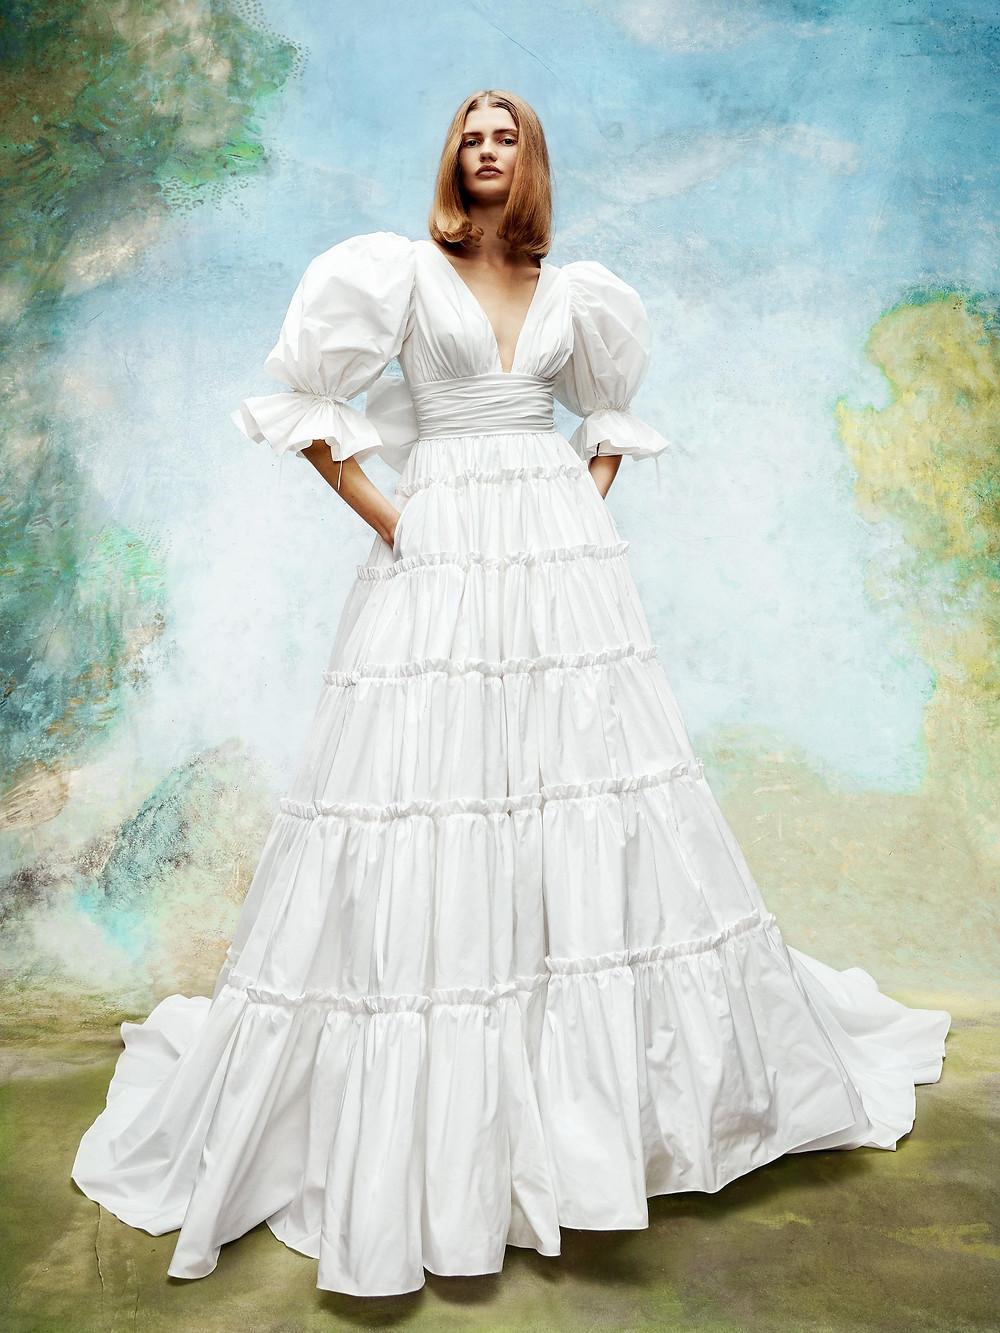 A Viktor & Rolf linen 3/4 puff sleeve, ball gown wedding dress, with low v neckline